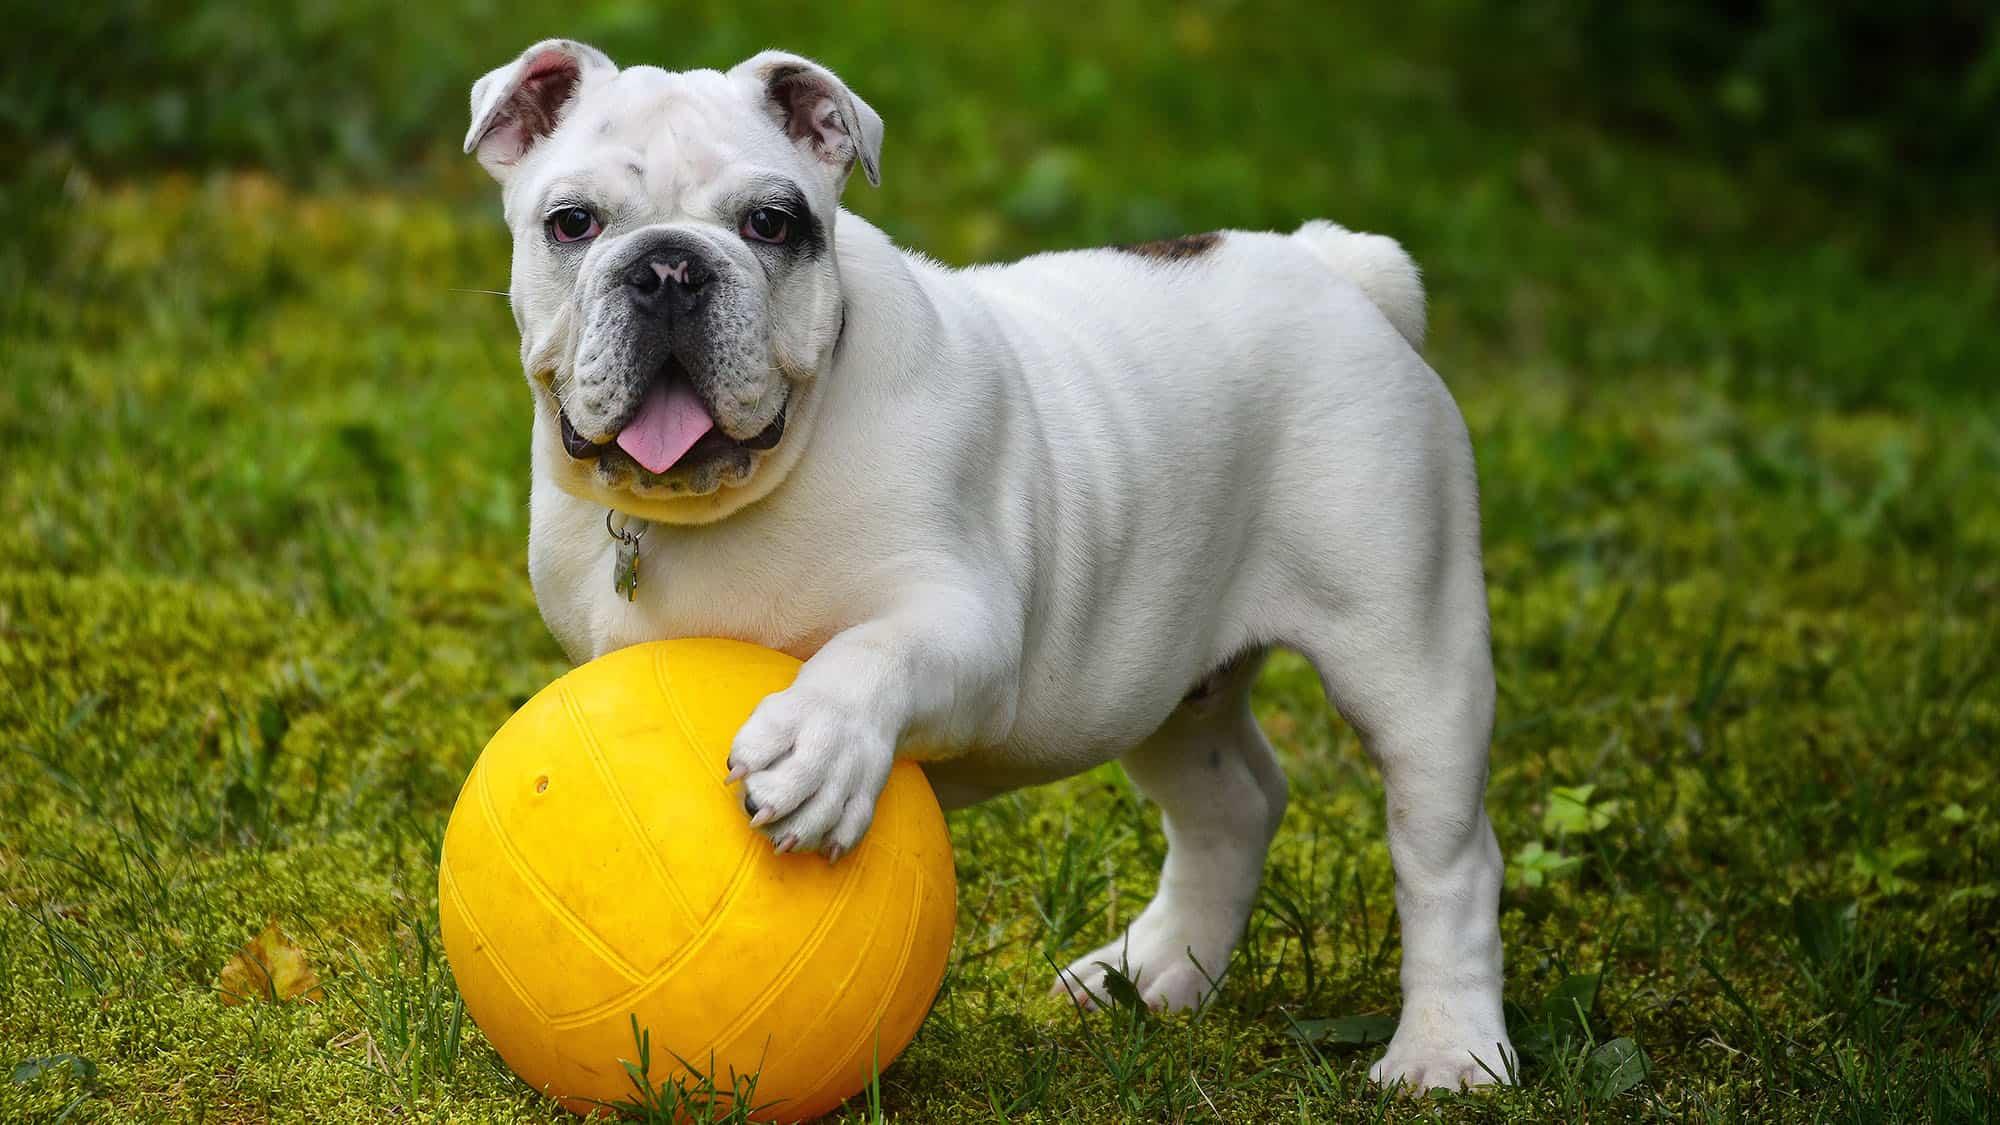 CyberPet - Bulldog